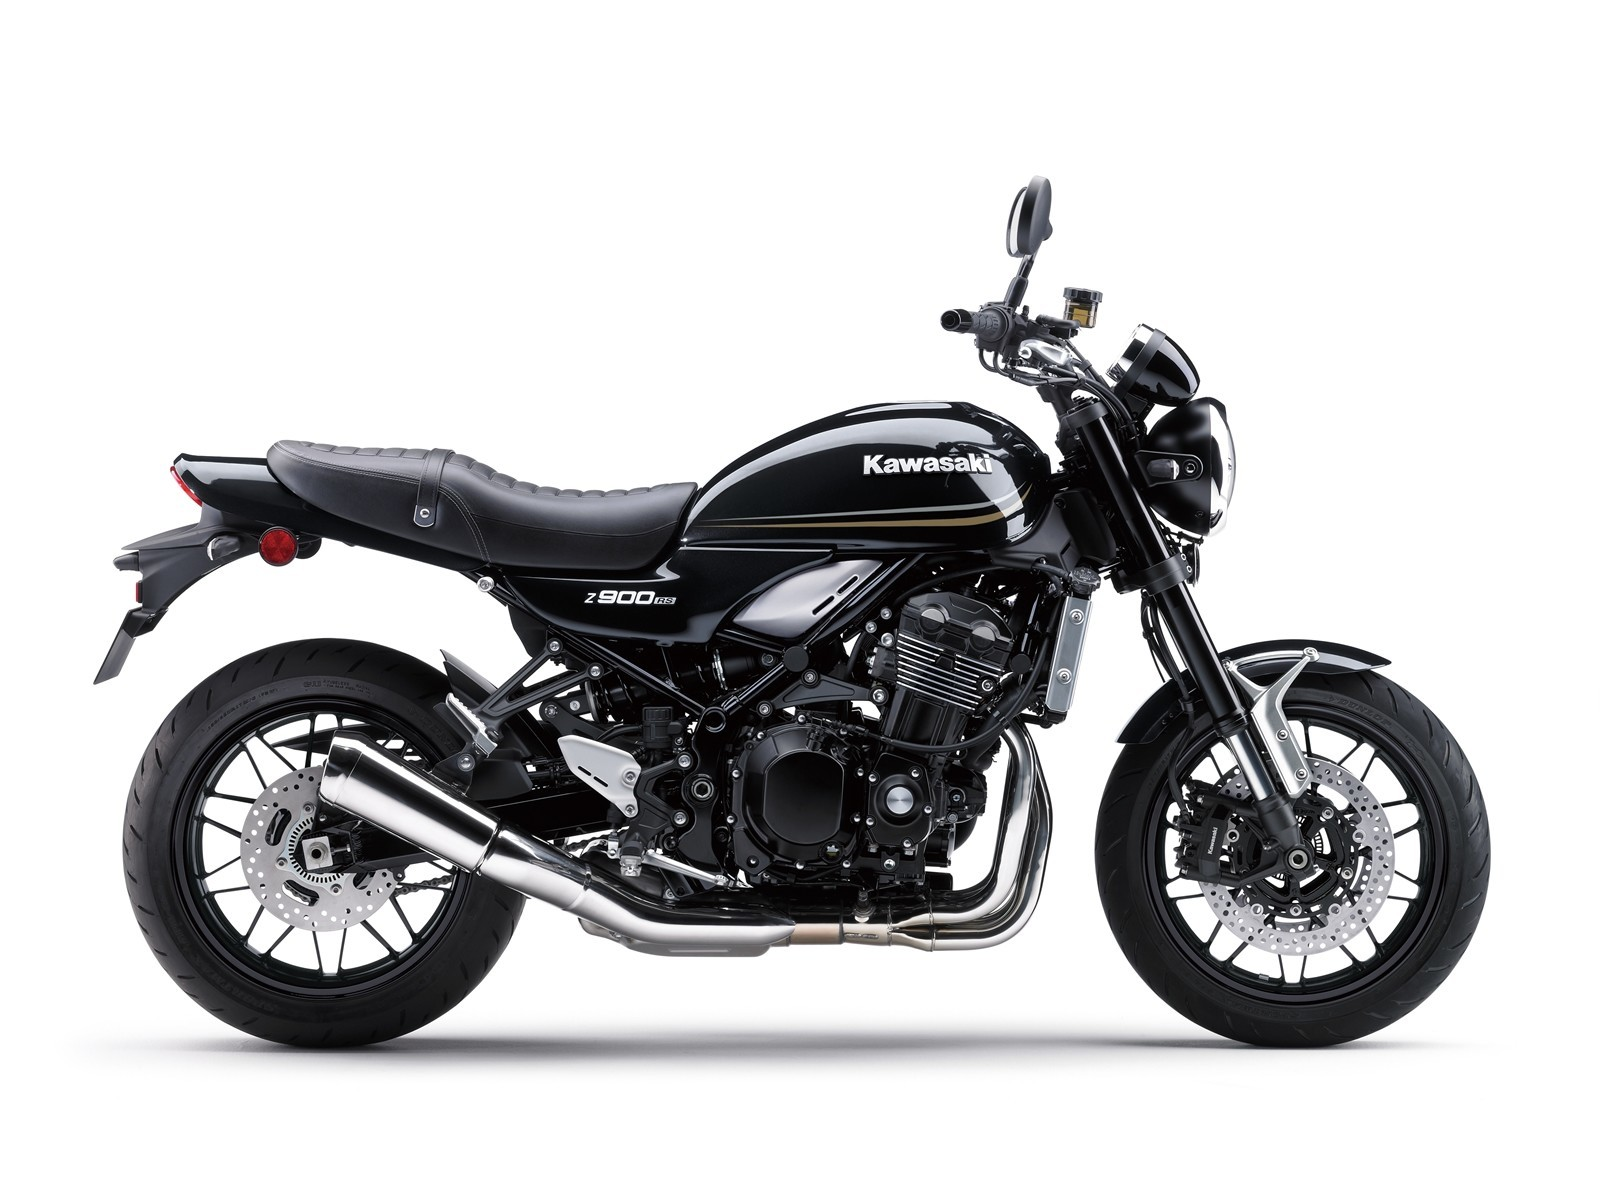 Kawasaki Z900rs Oferta Dm 3